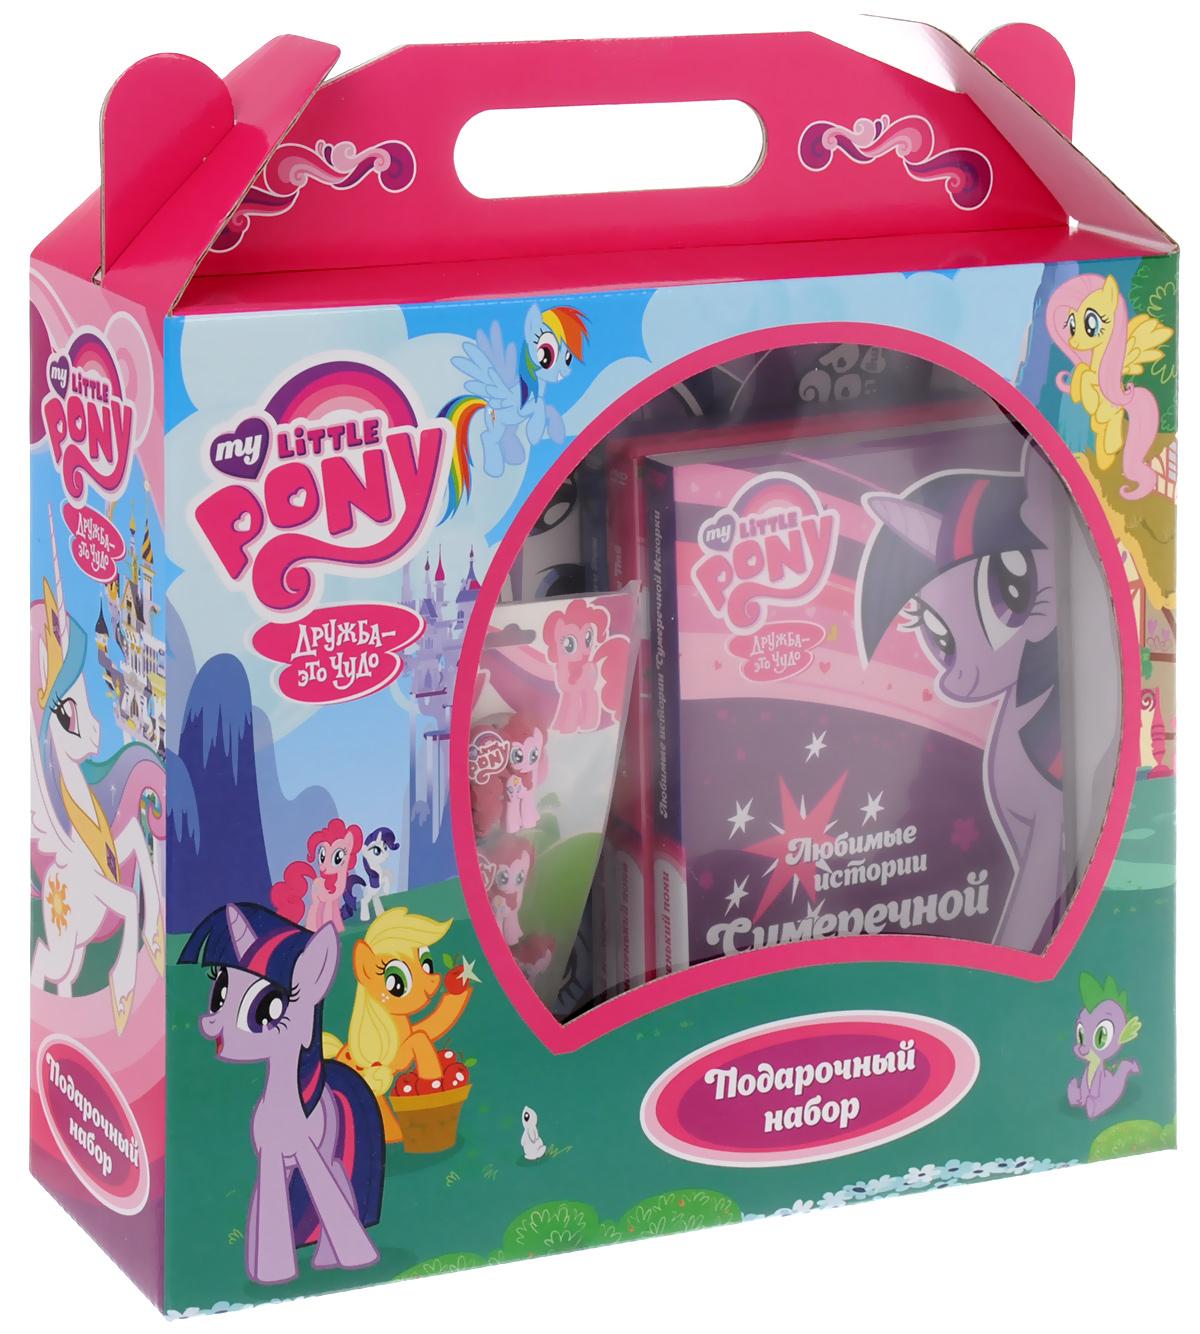 My Little Pony: Подарочный набор (3 DVD + сувениры) видеодиски нд плэй бриджит джонс 3 dvd video dvd box